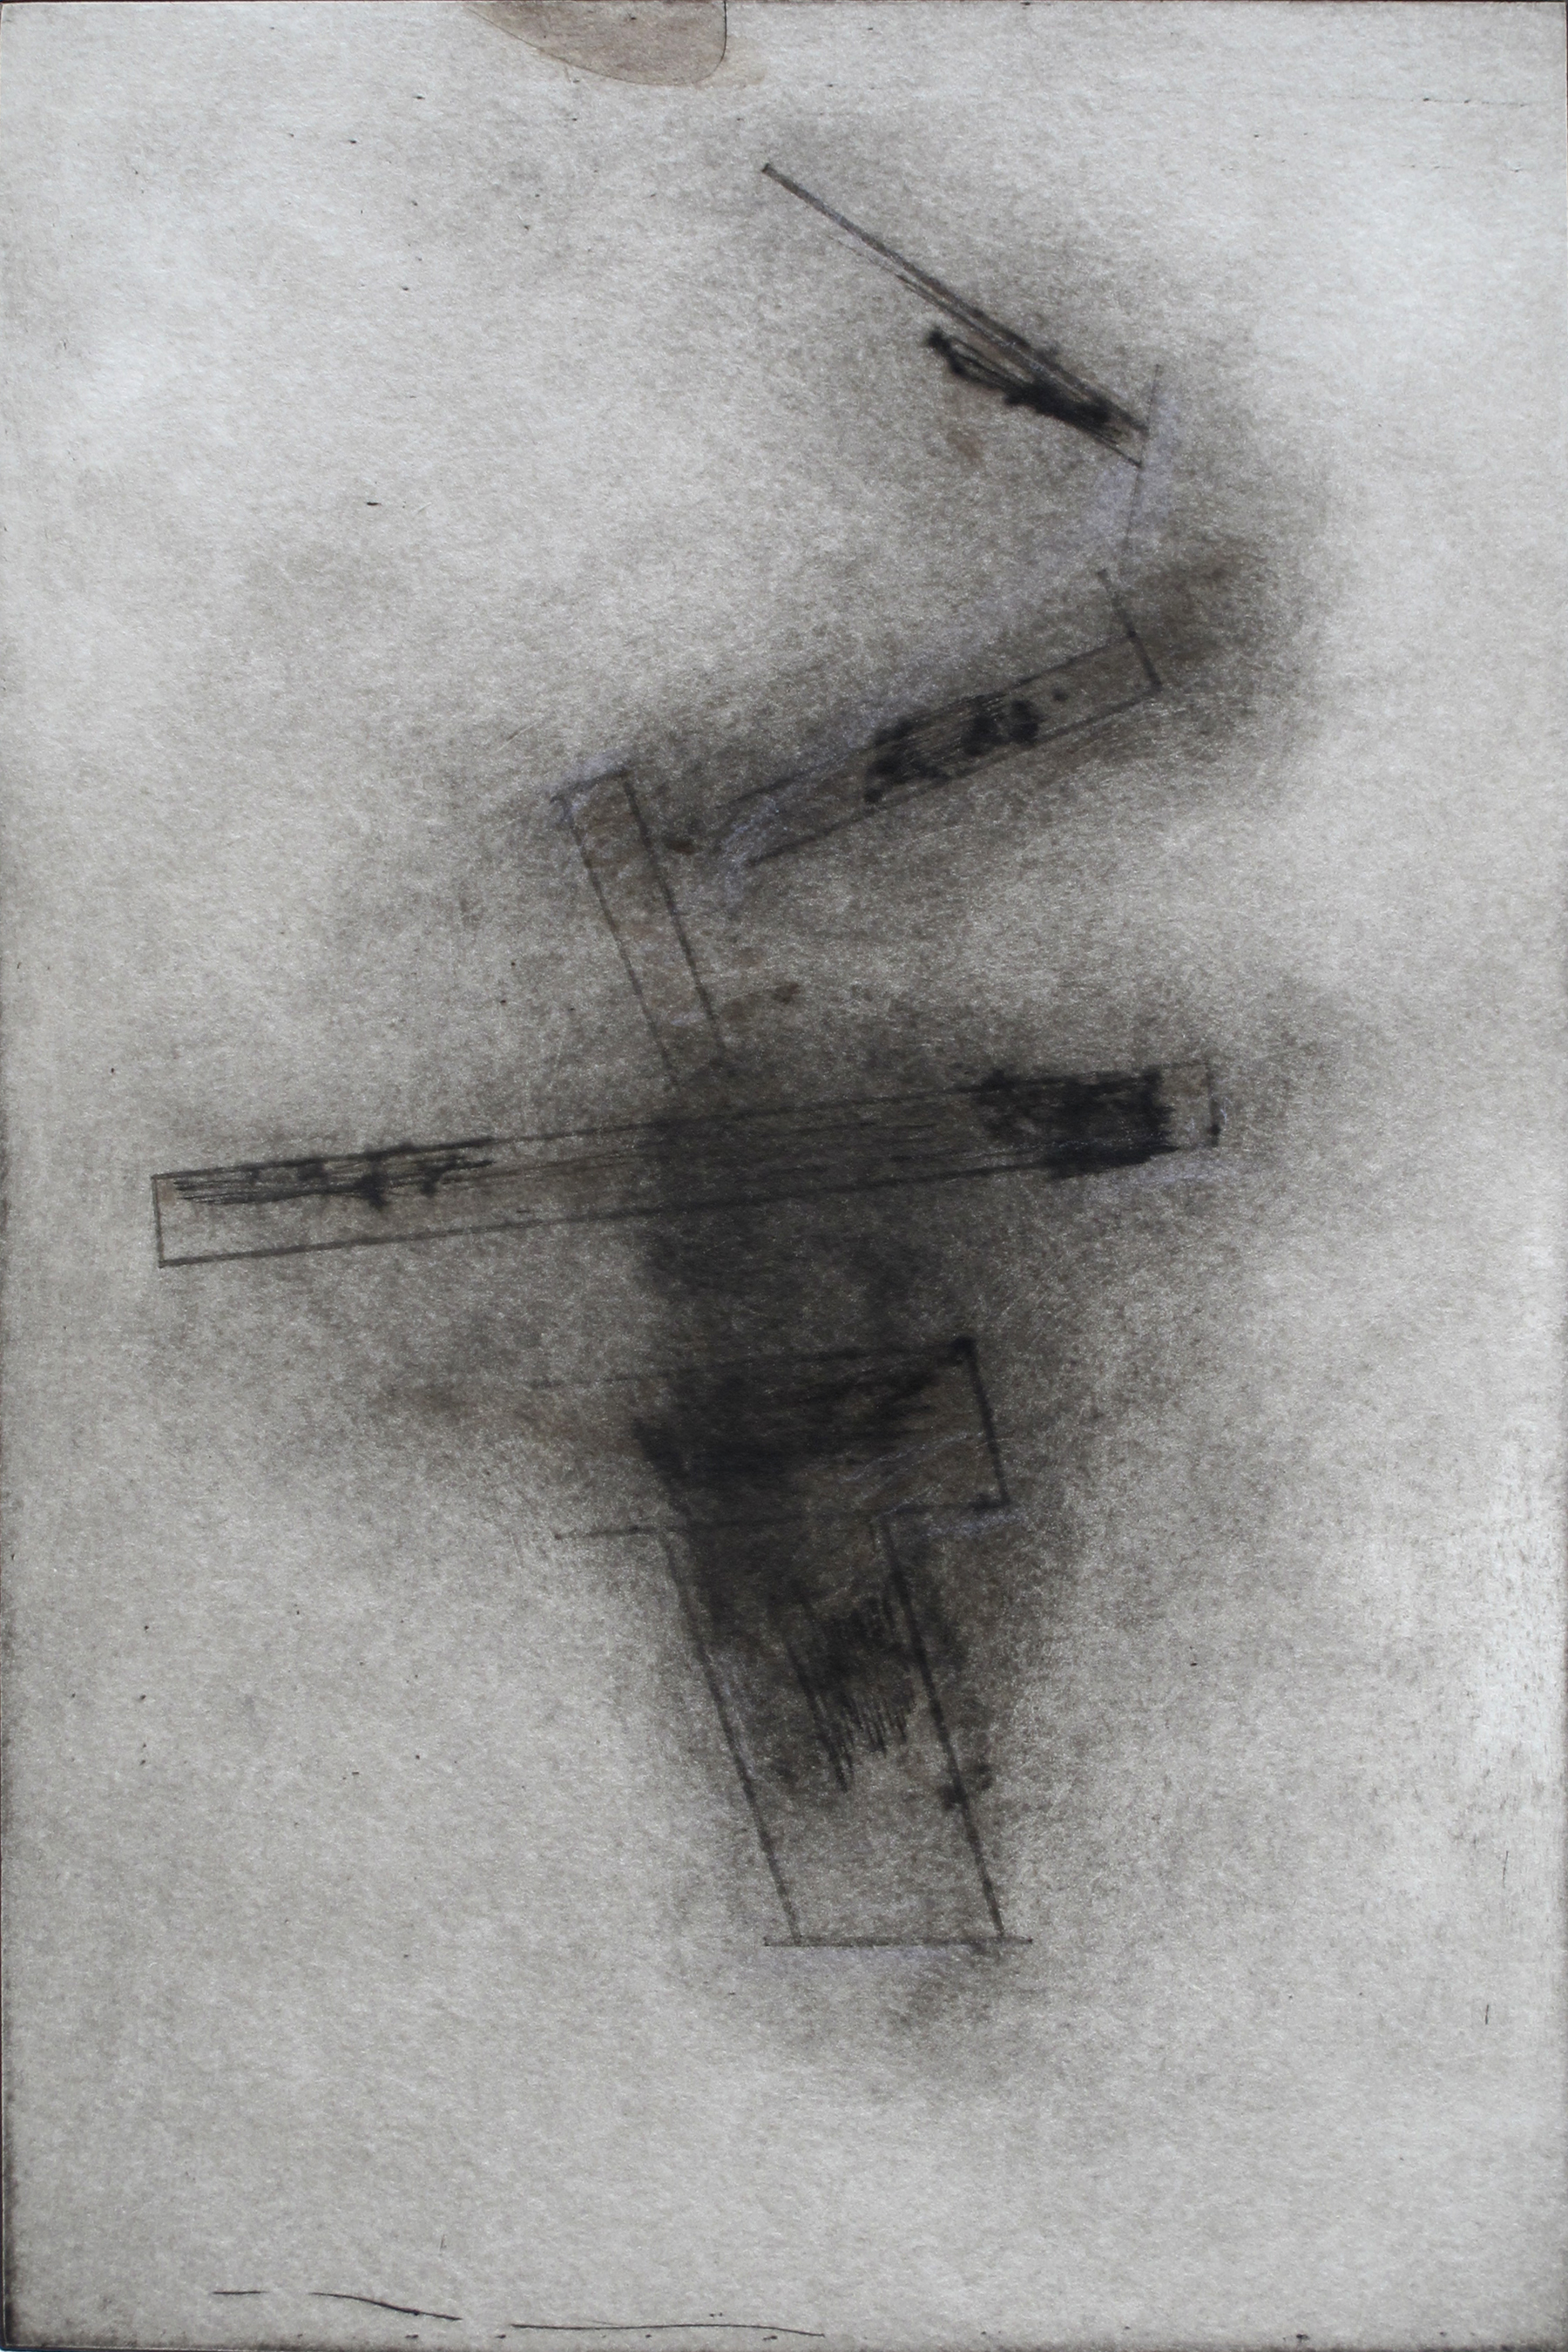 "Fallen Stones  Stephen Hazel SH 169 Drypoint Mezzotint, Hand-colored on Deckled Paper 17"" x 21"""